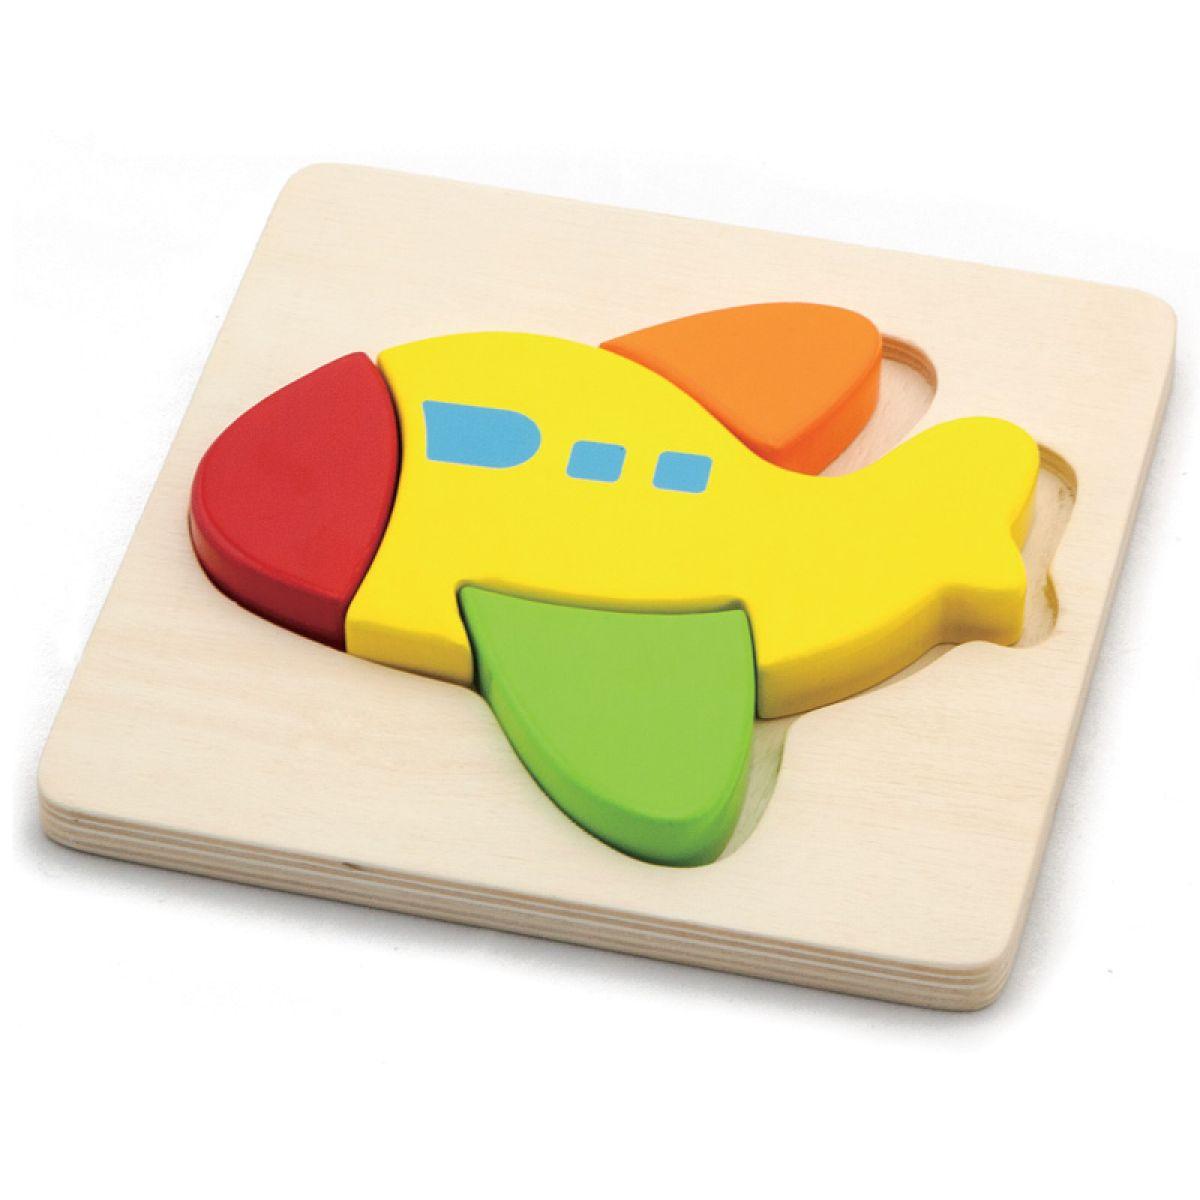 HM Studio Study Wood Puzzle Lietadlo